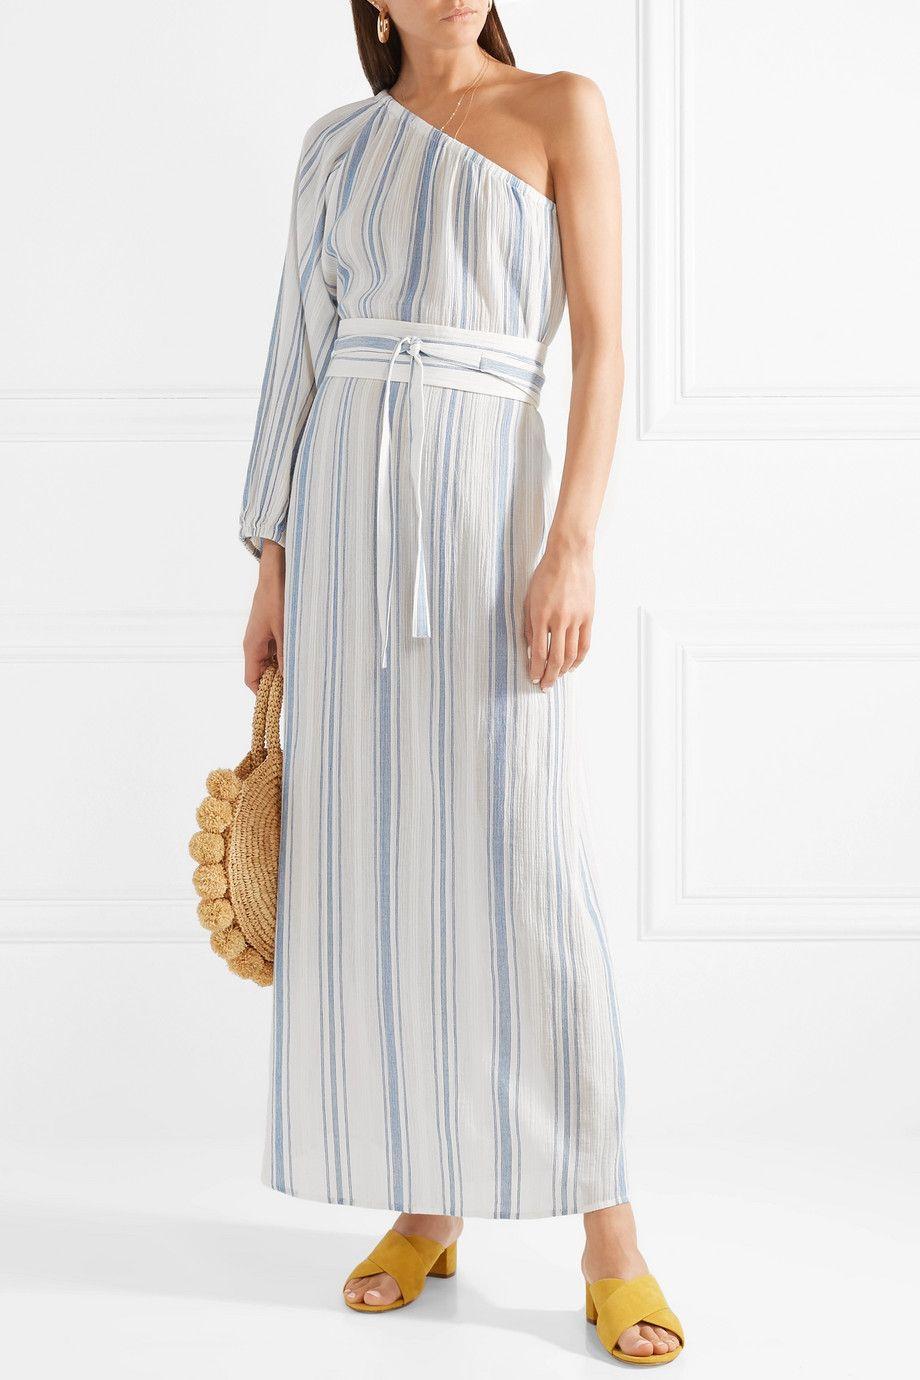 Ivana One-shoulder Striped Cotton-gauze Midi Dress - Blue Vanessa Bruno Buy Cheap Best Wholesale Best Choice Purchase Cheap Sale 2018 J4lNr6